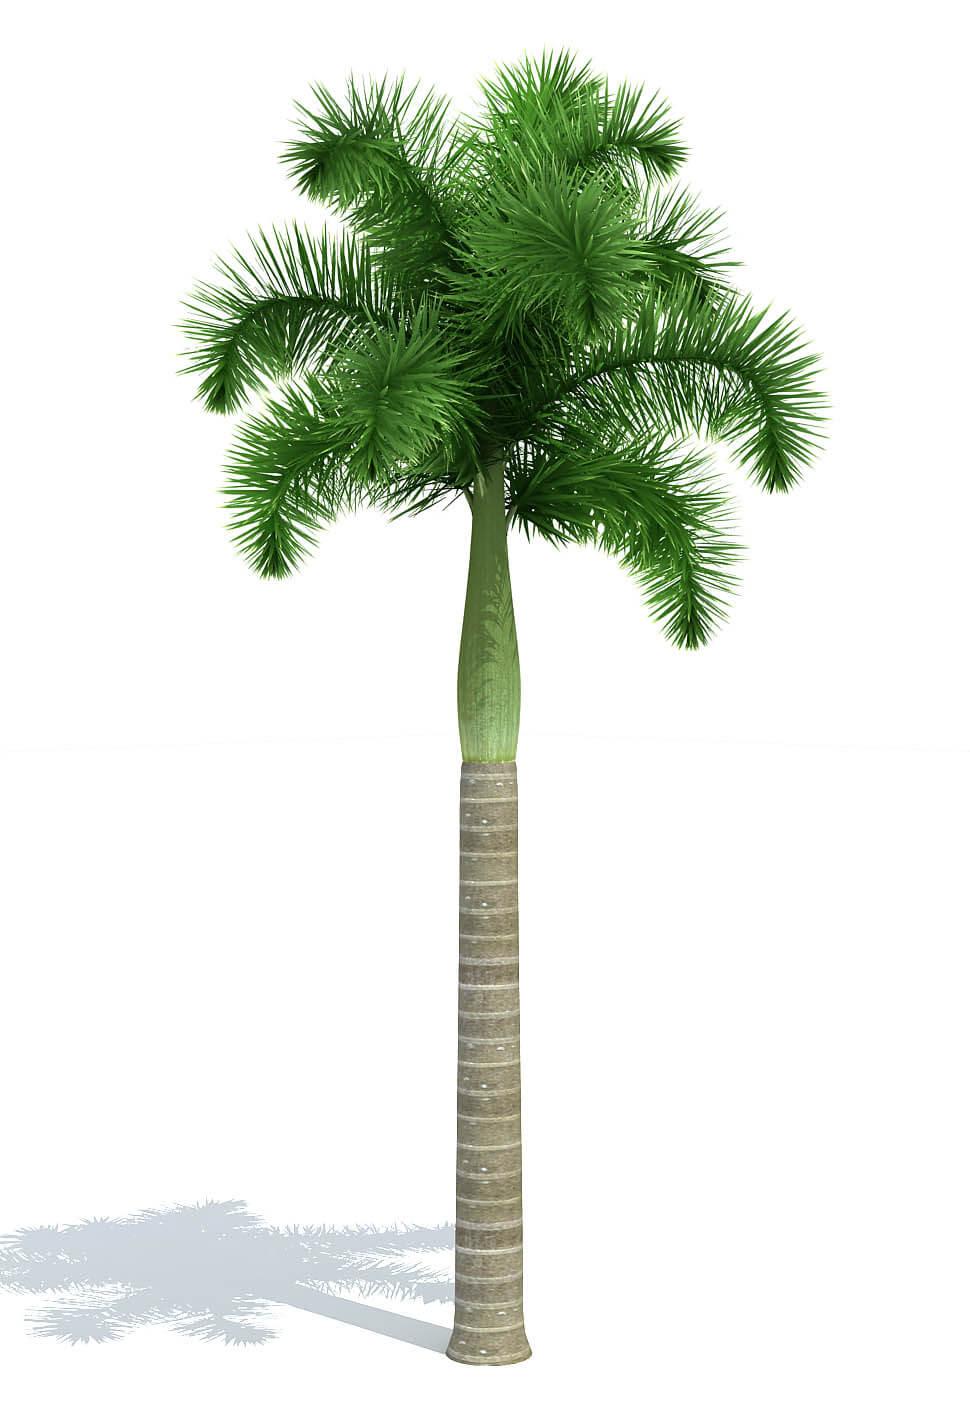 Free plant models for GrowFX - 3ds Max Models | Kstudio